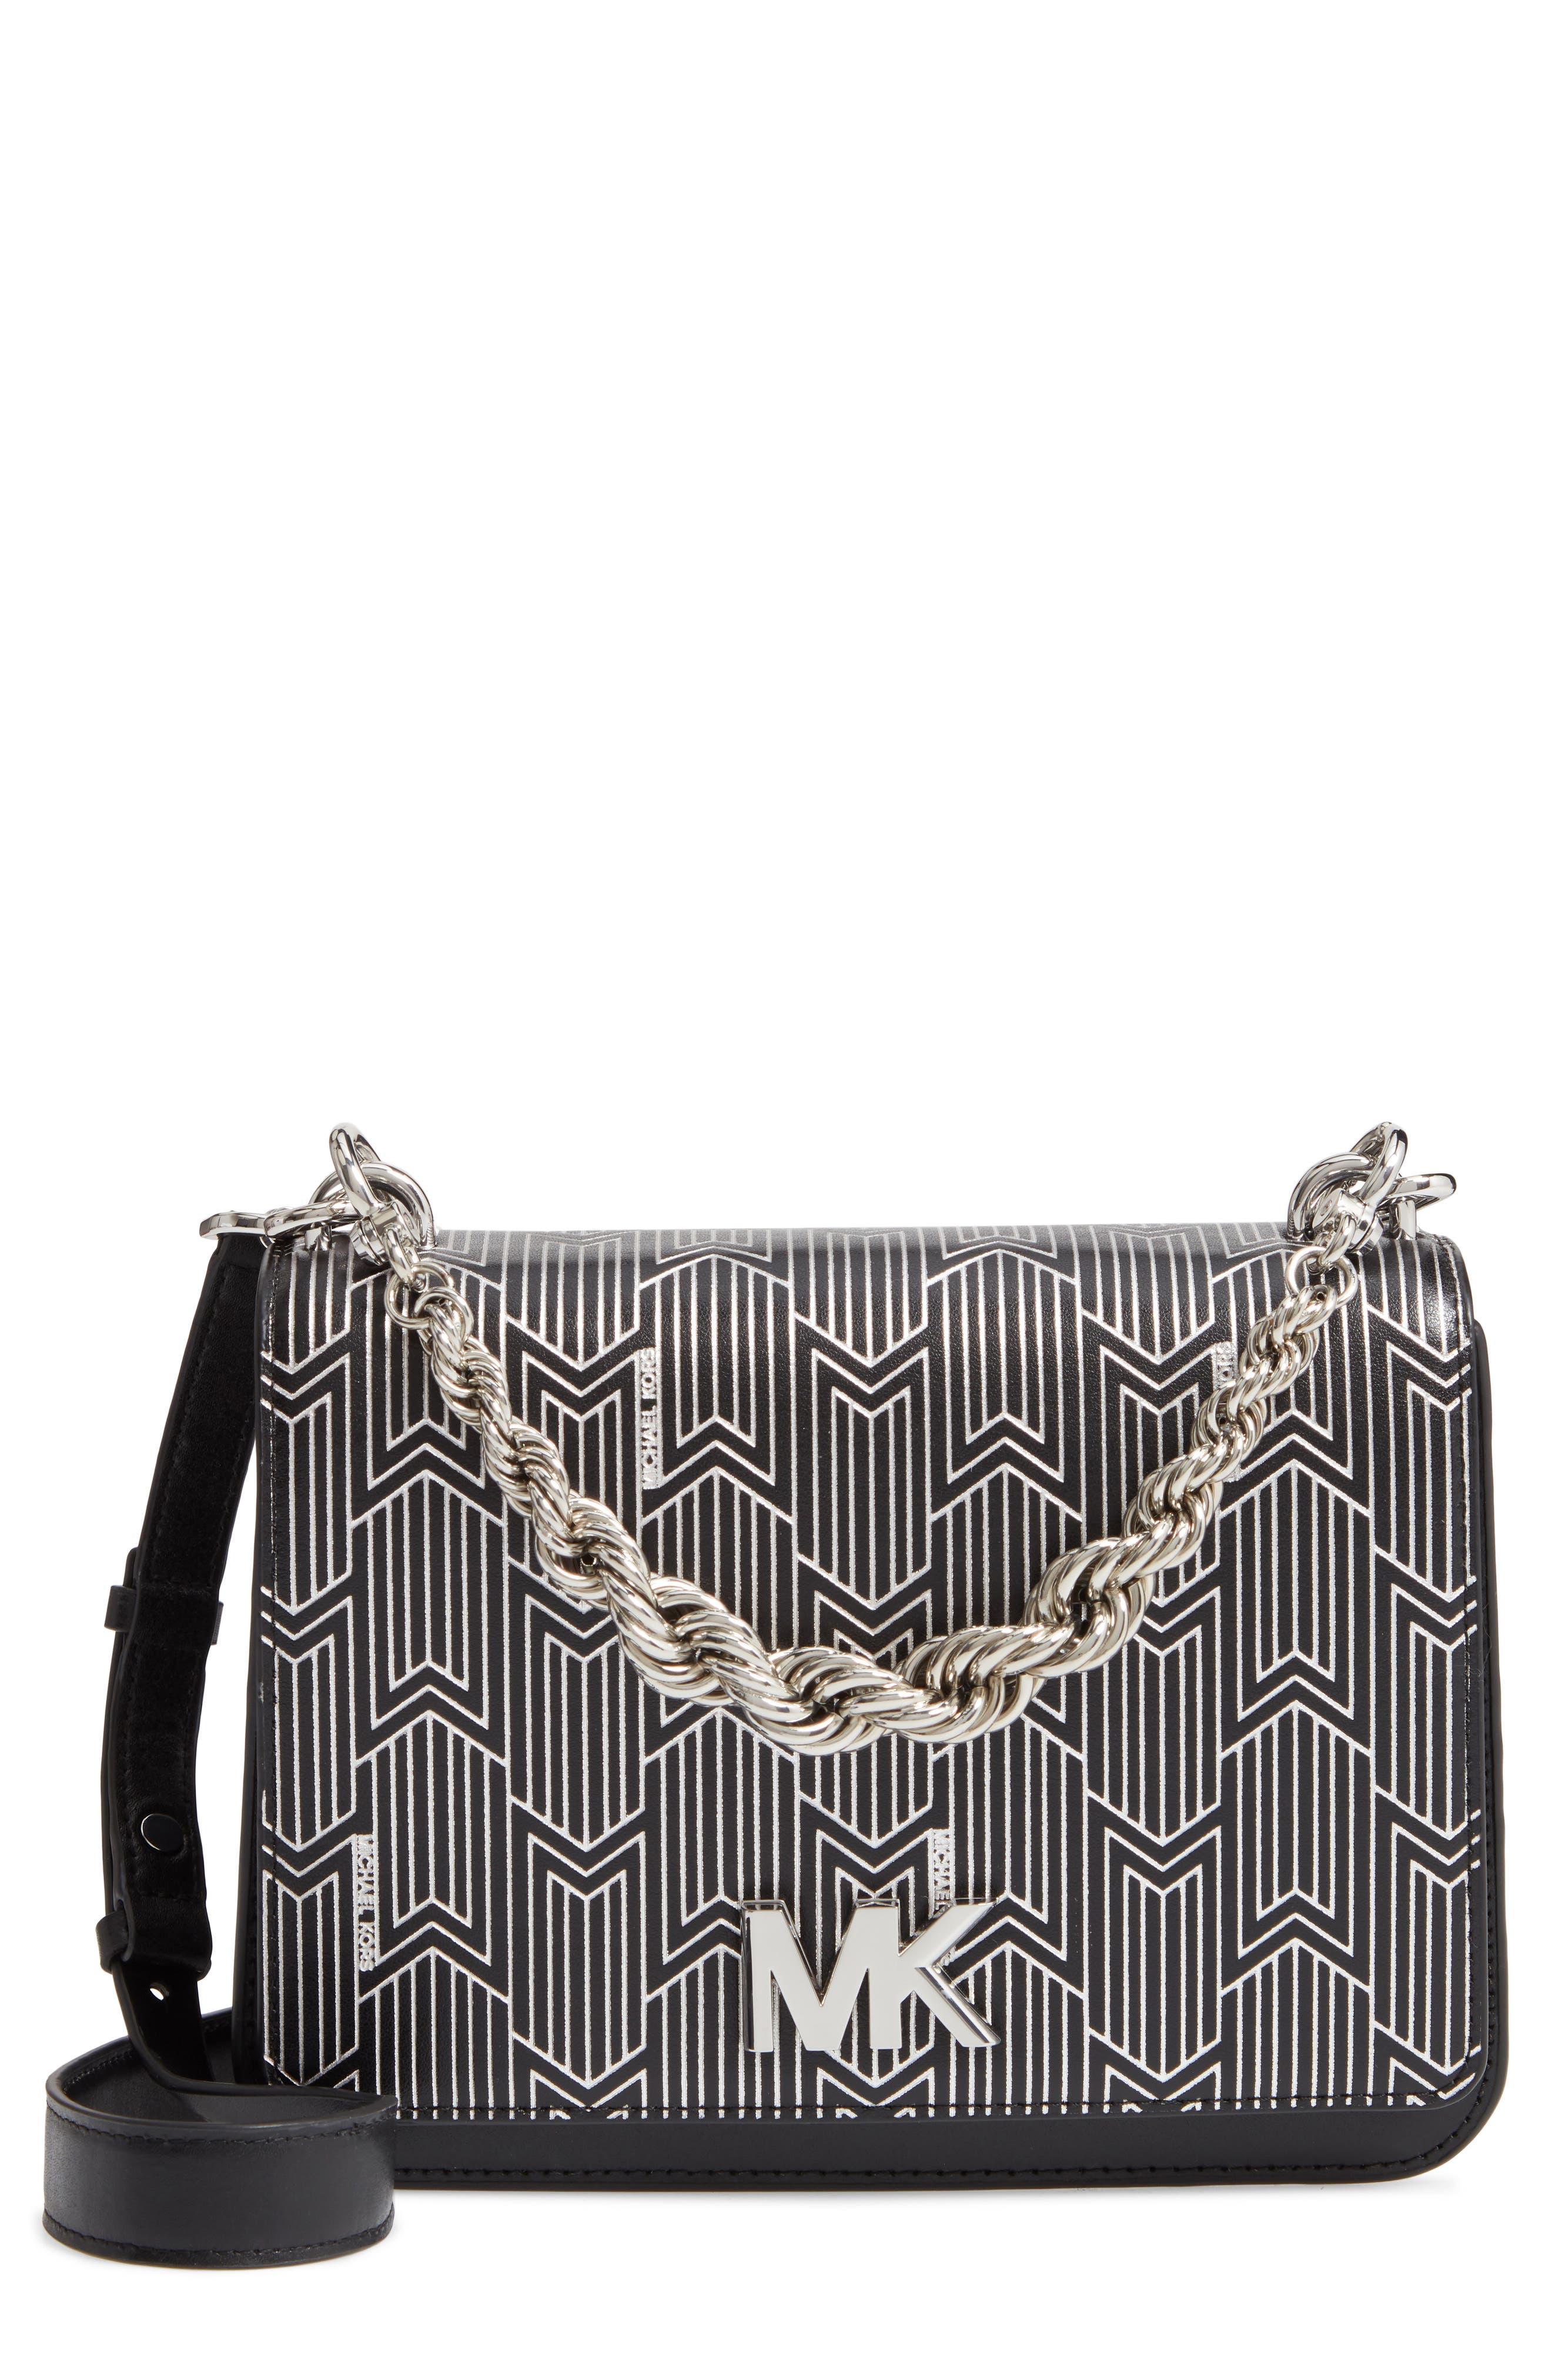 michael michael kors handbags wallets for women nordstrom rh shop nordstrom com michael kors handbags clearance nordstrom michael kors mens wallet nordstrom